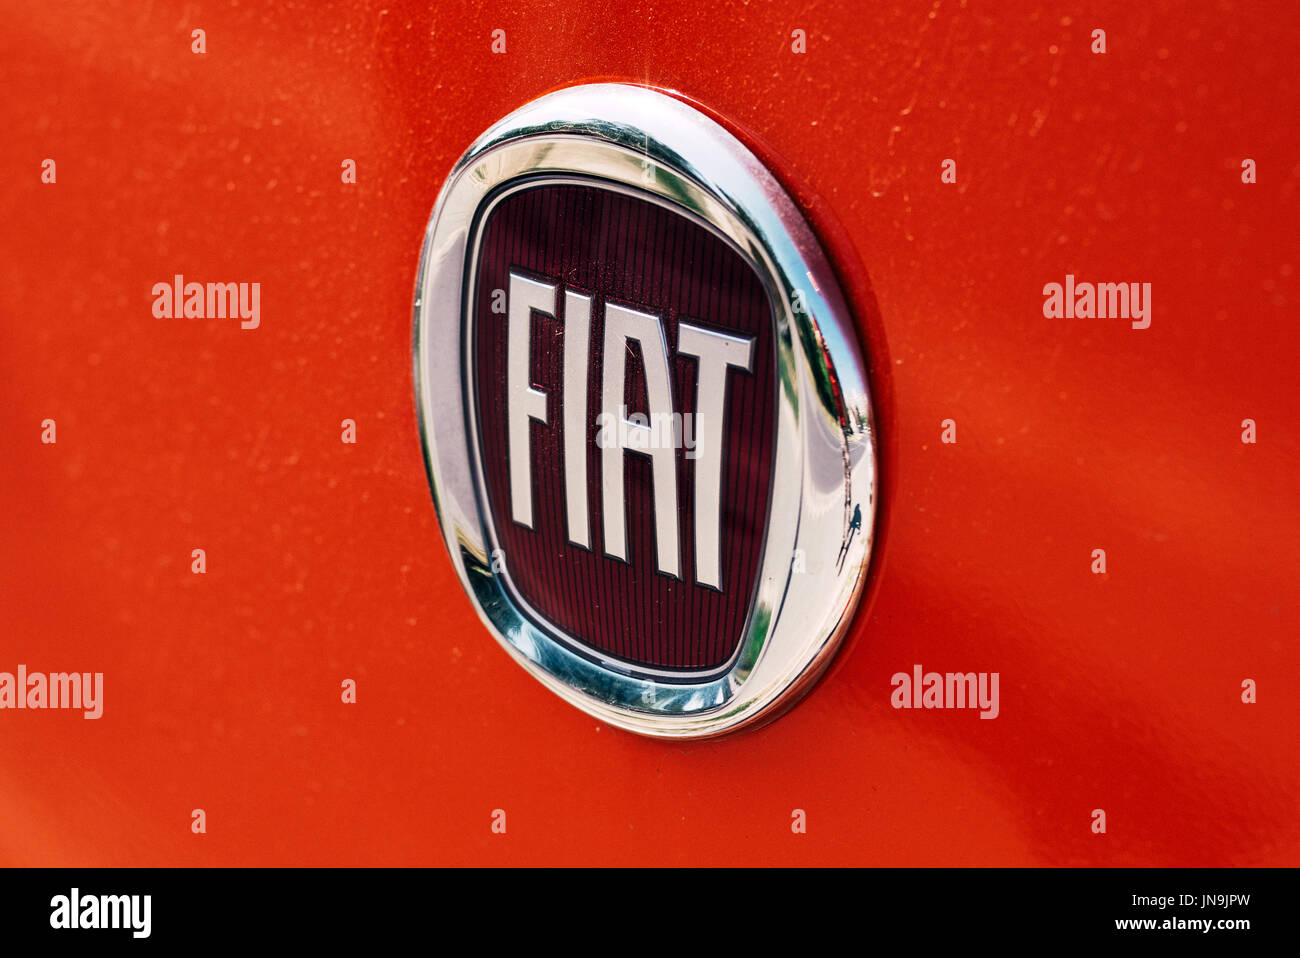 Fiat chrysler automobiles stock photos fiat chrysler automobiles novi sad serbia july 20 2017 fiat automobiles logo the largest biocorpaavc